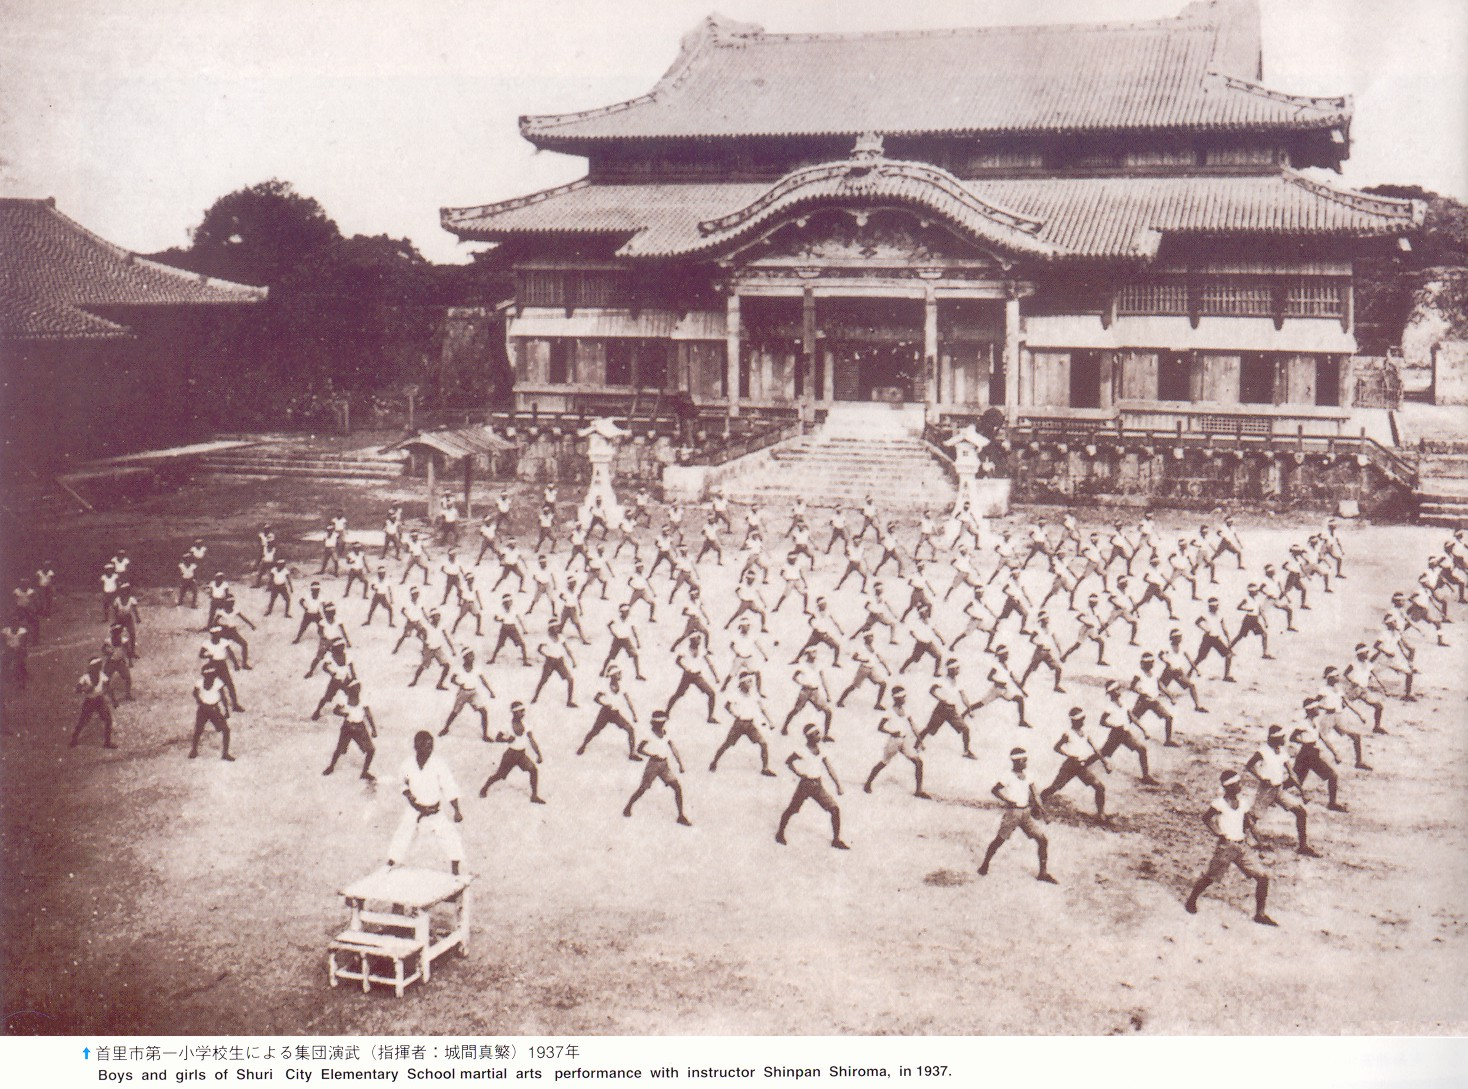 High school karate practice in Shuri in 1937